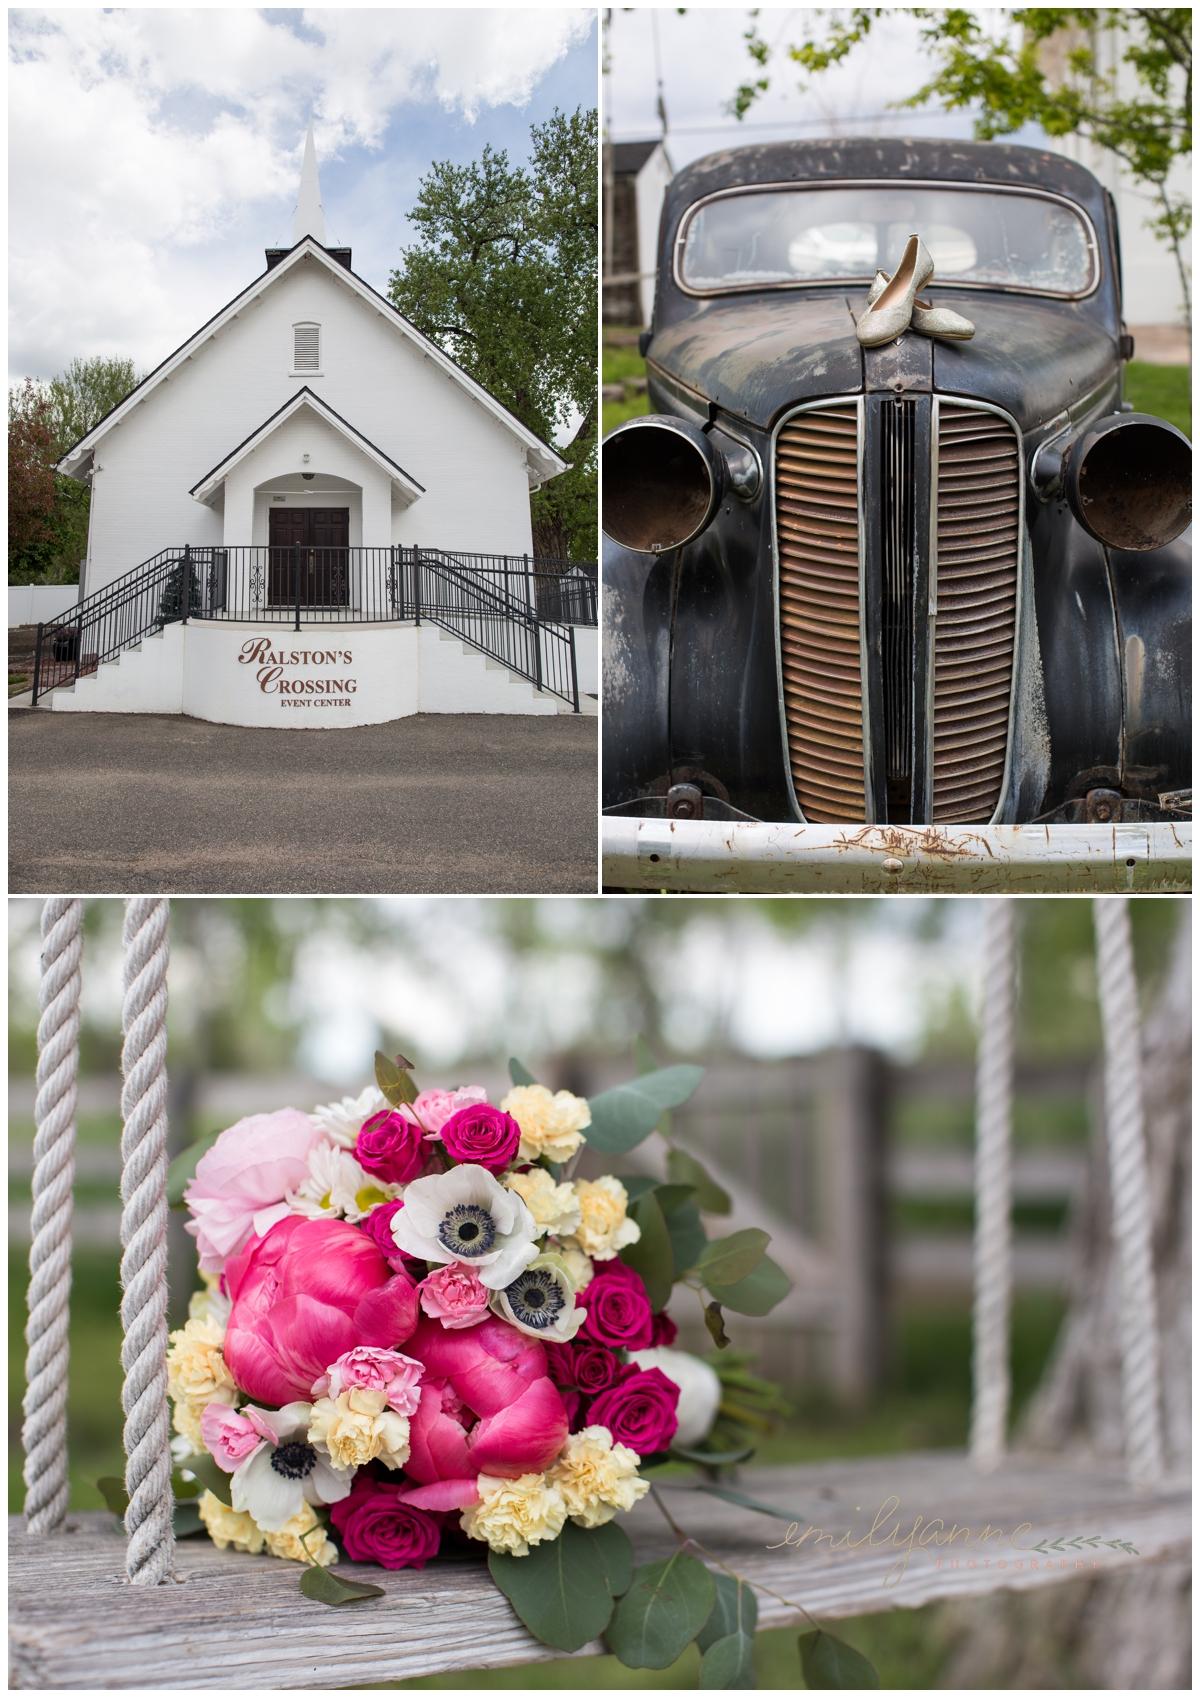 Ralston's Crossing Wedding    www.emilyanne-photography.com